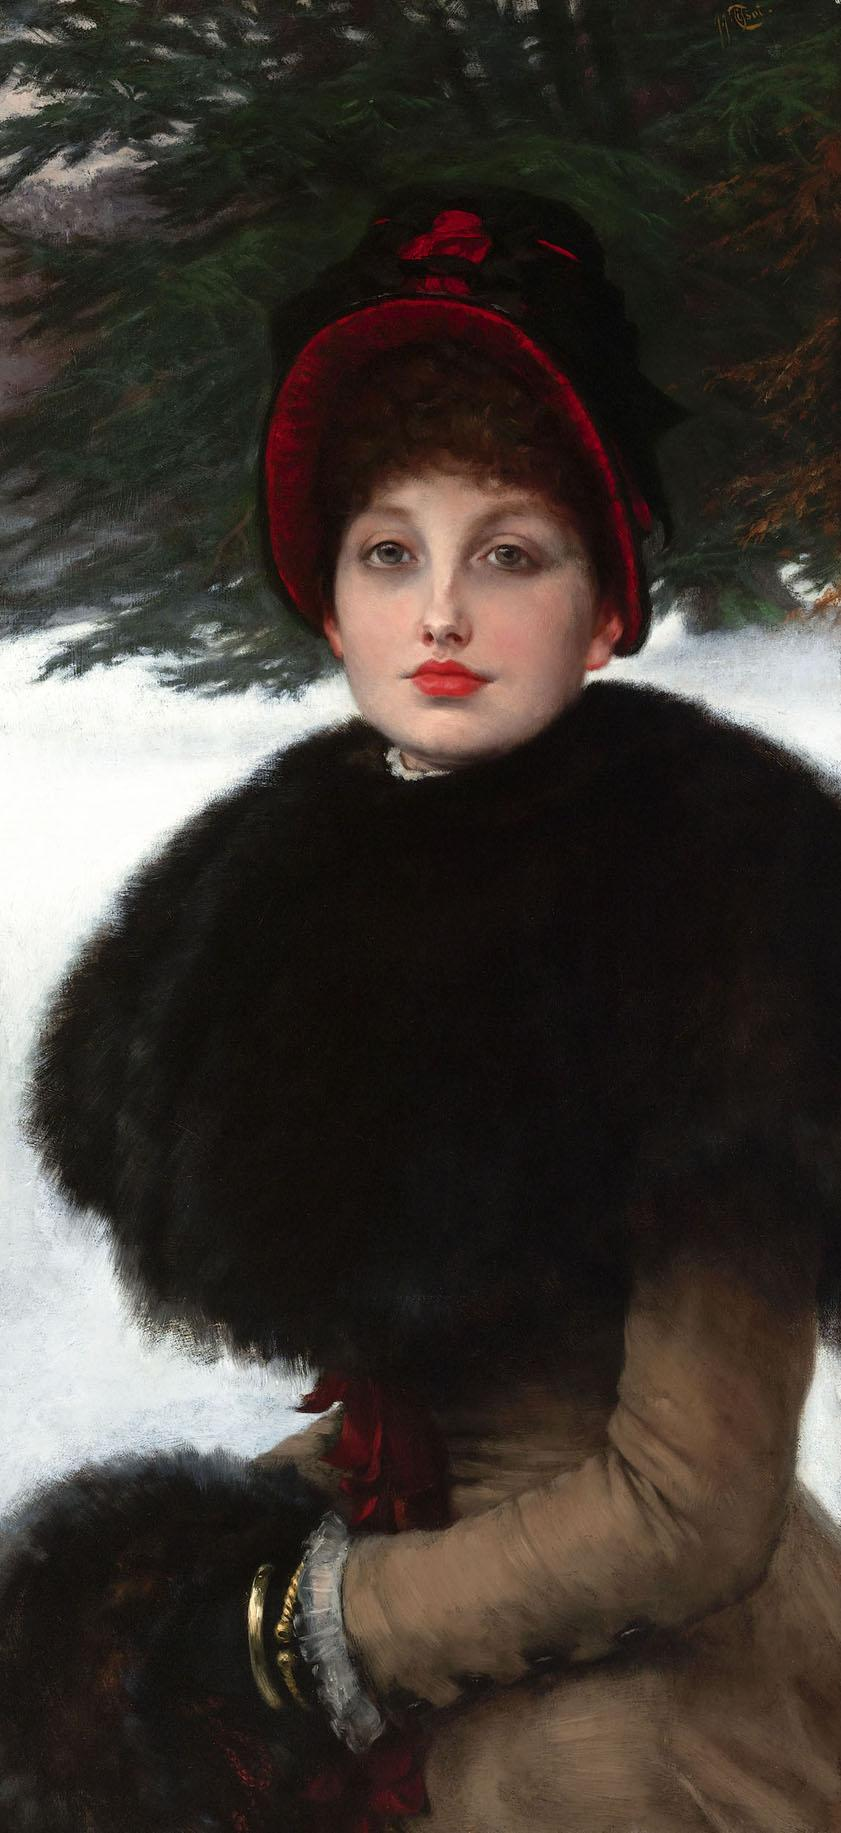 A-Winter-s-Walk-Promenade-dans-la-neige-by-James-Jacques-Joseph-Tissot